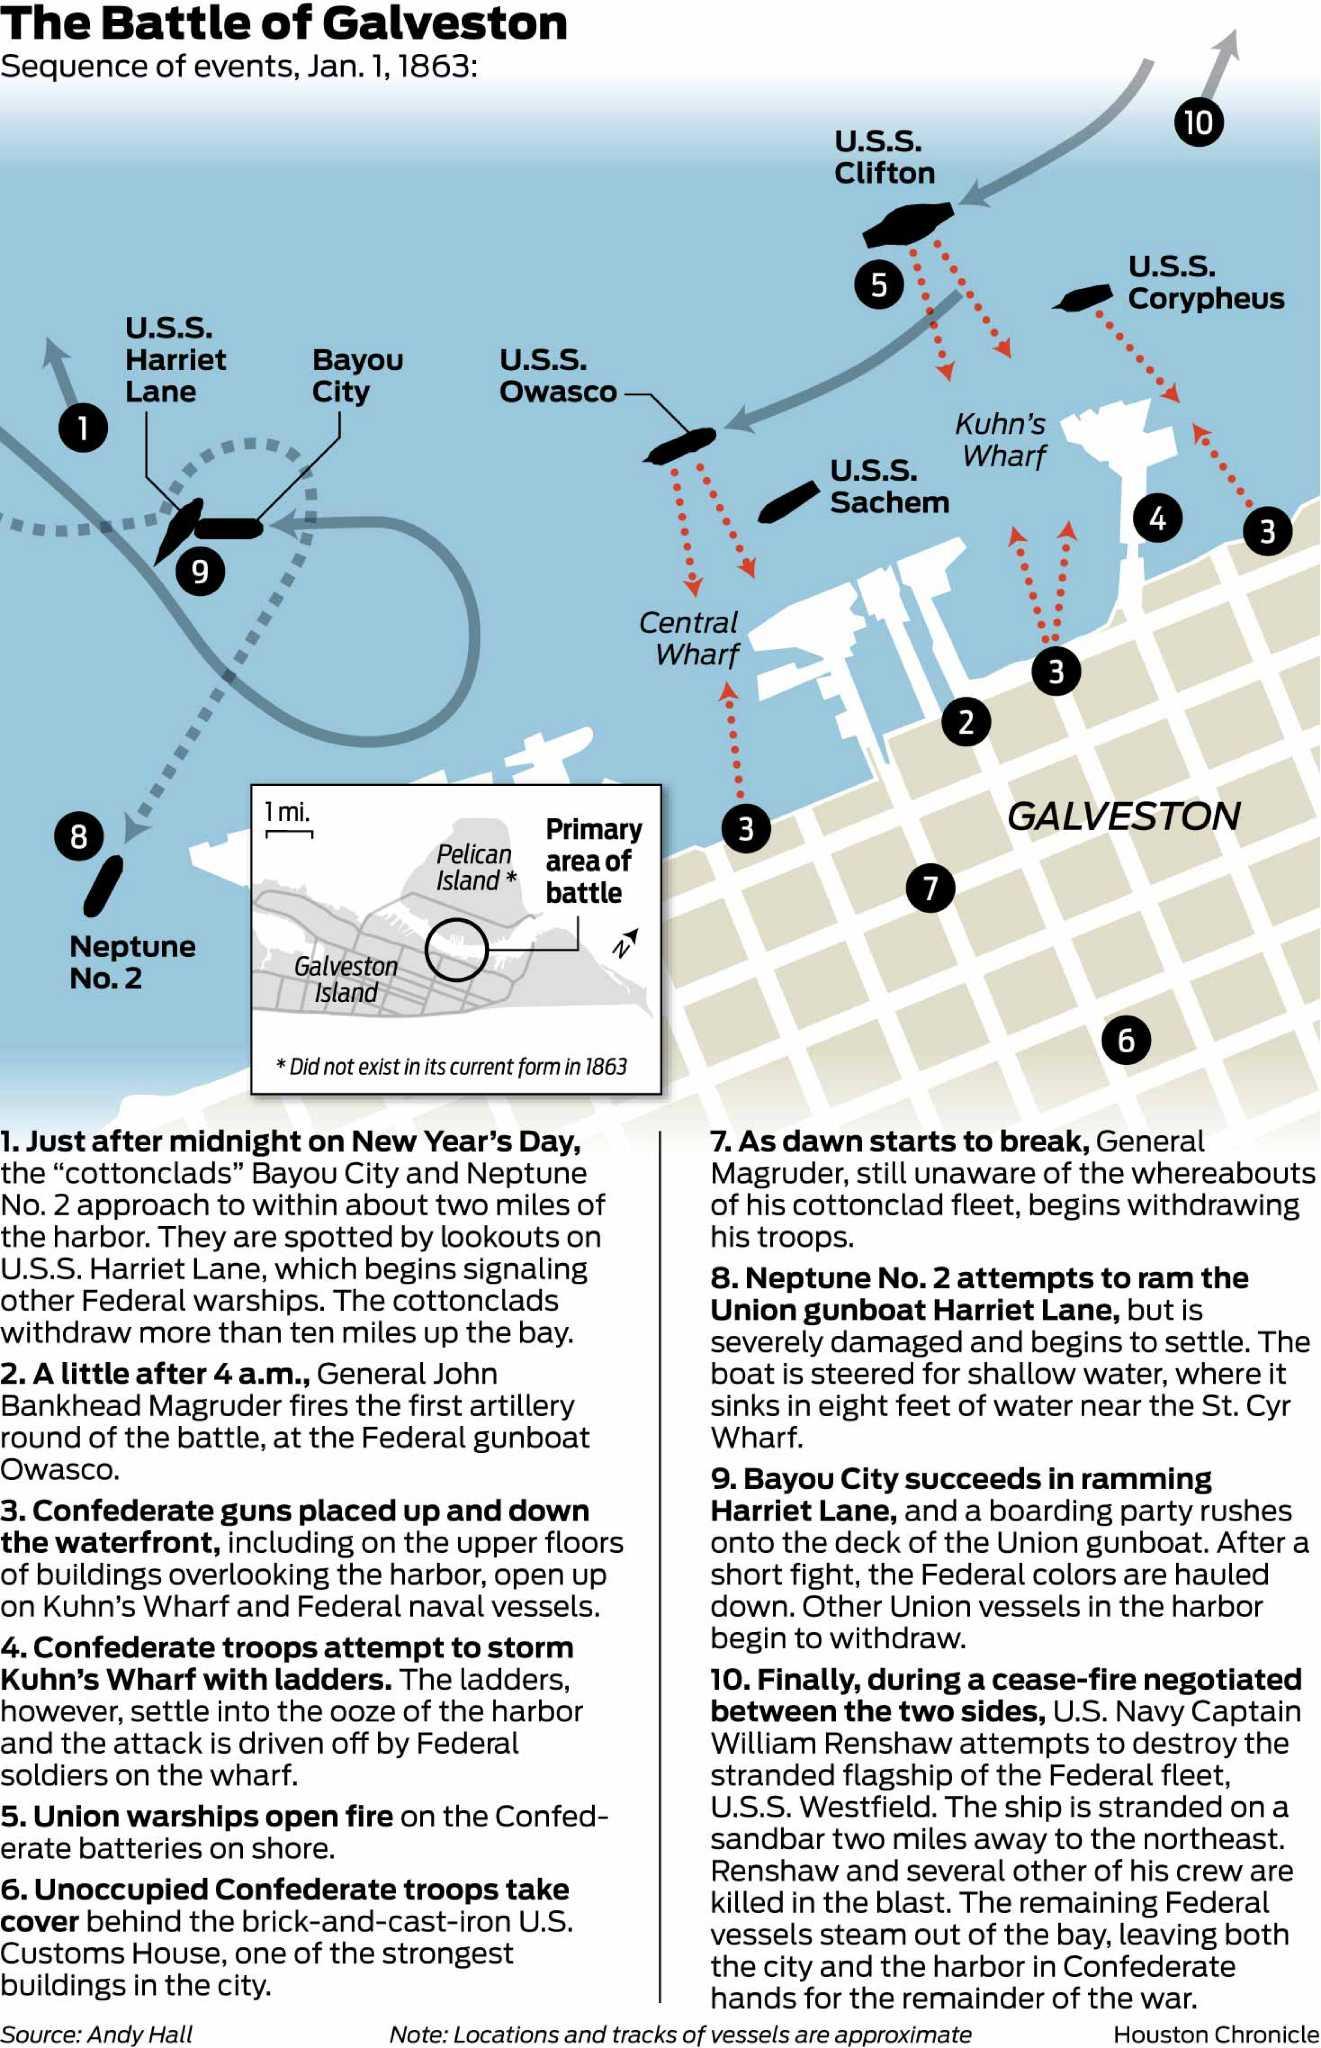 Battle of Galveston saved Texas from Union invasion